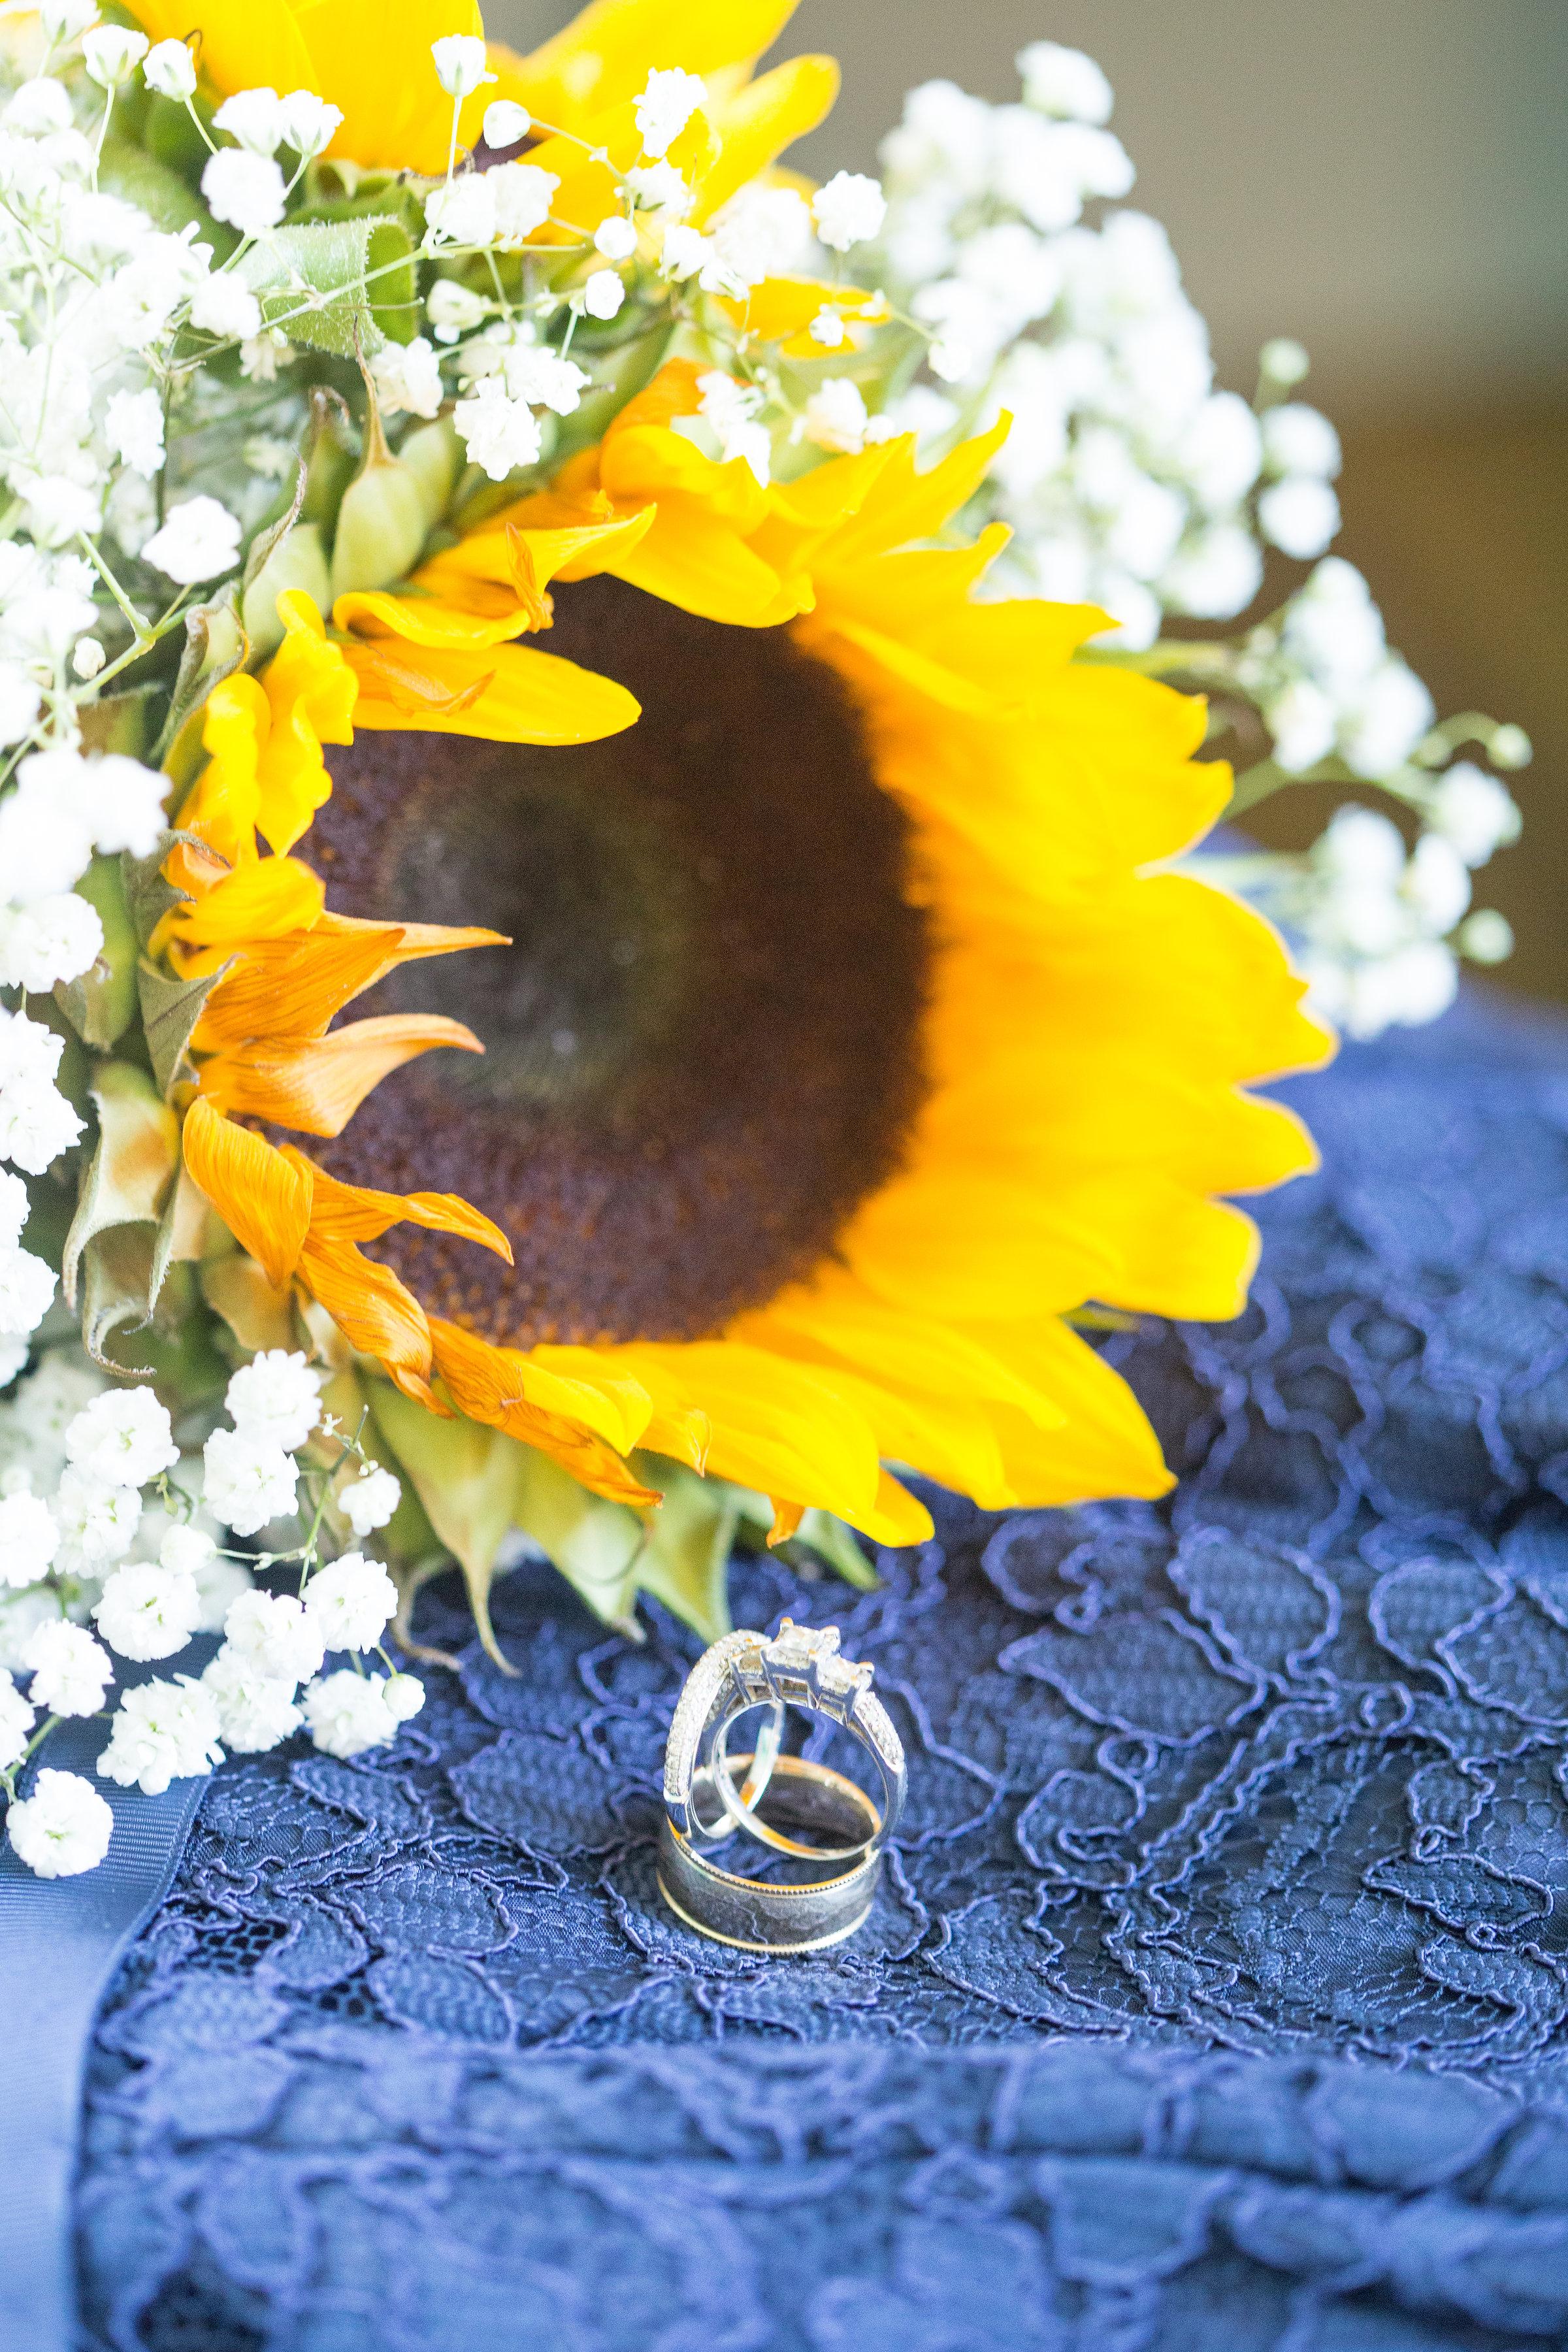 sunflower-bridesmaid-bouquet-engagementring-photos.jpg